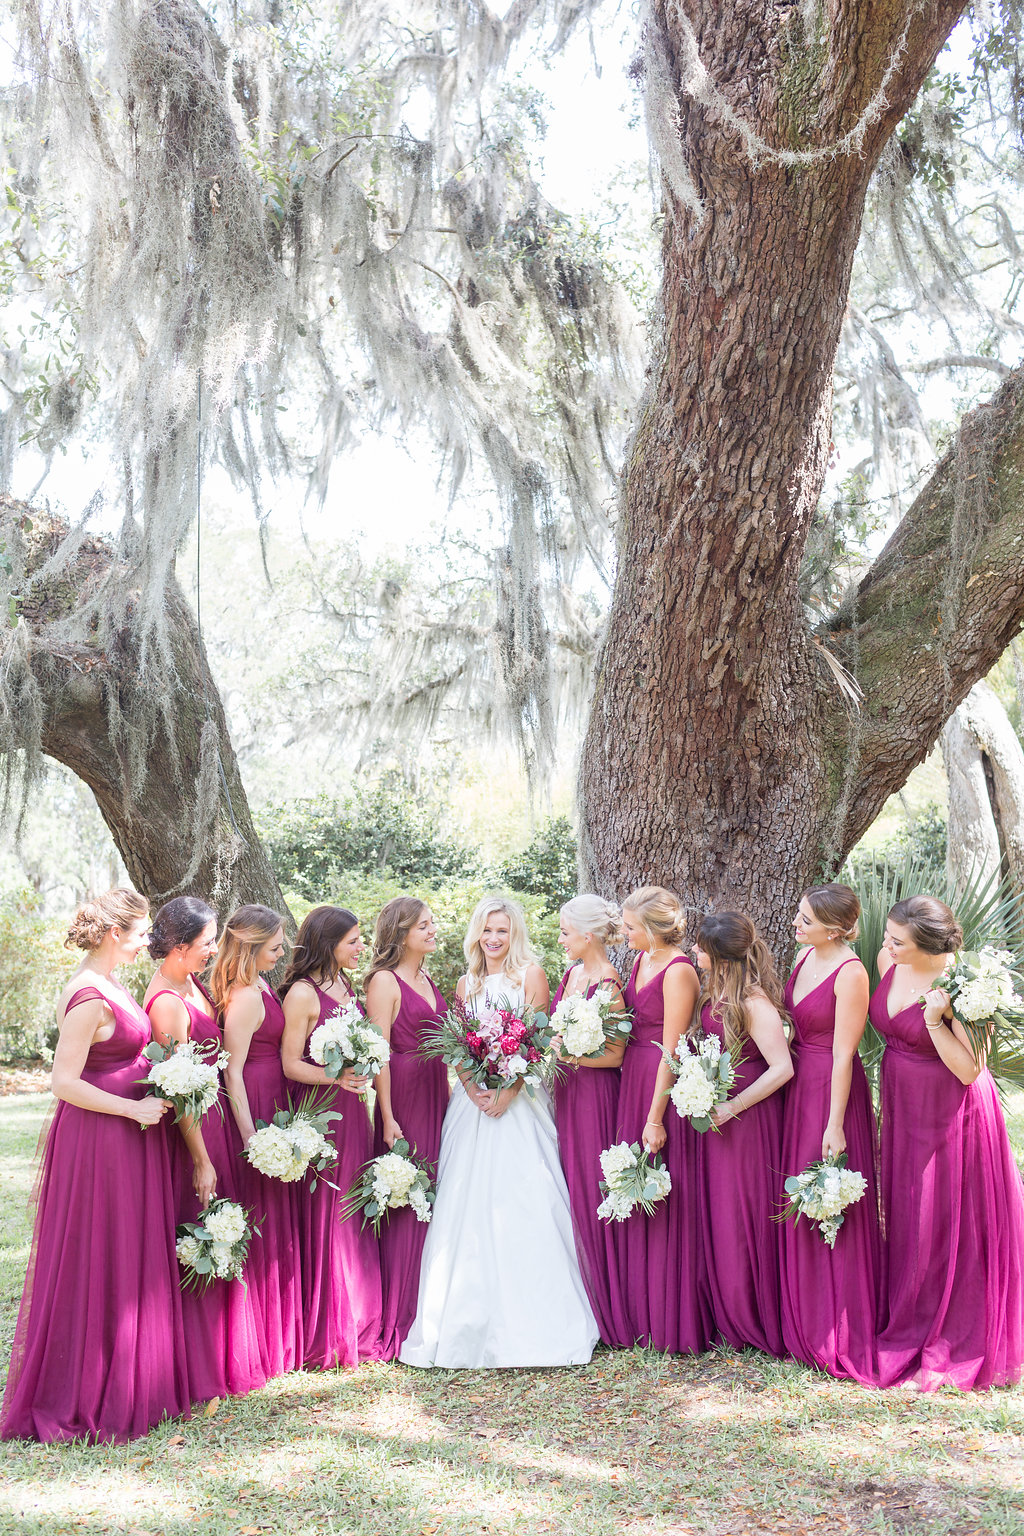 Dark Pink Bridesmaid Dresses - Musgrove Plantation Georgia Wedding Venue